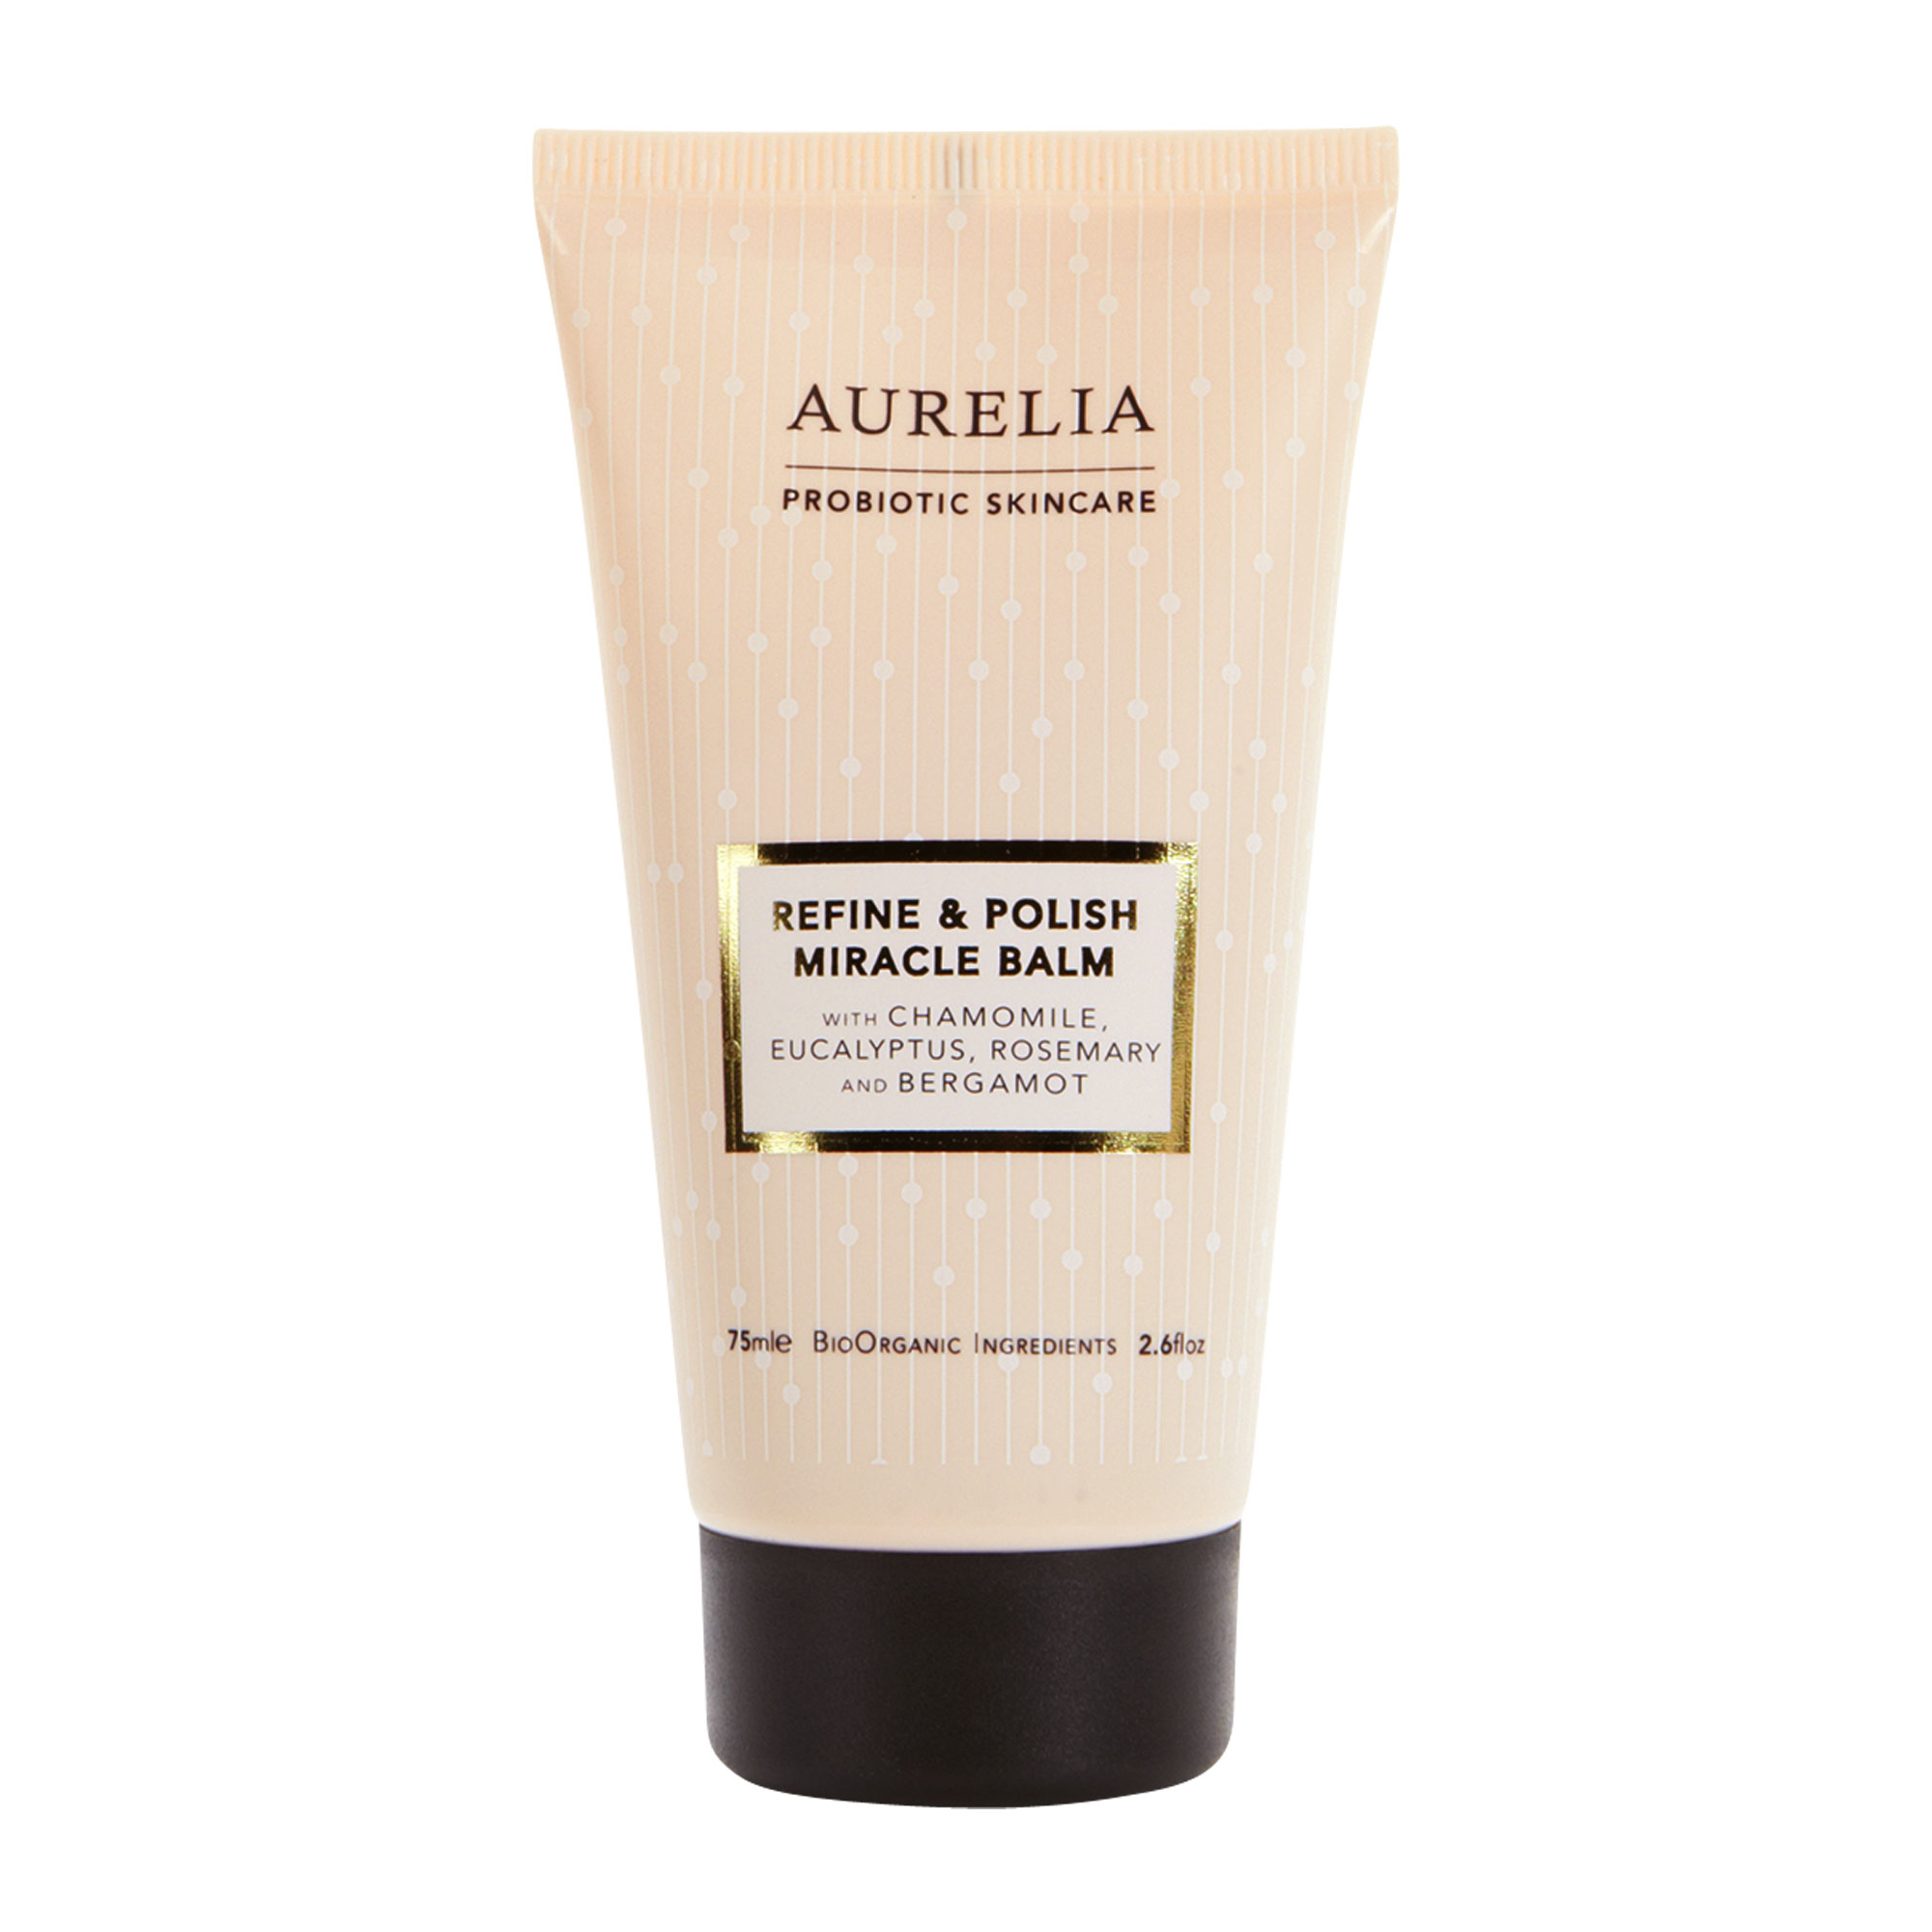 Aurelia Refine & Polish Miracle Balm, 75 ml